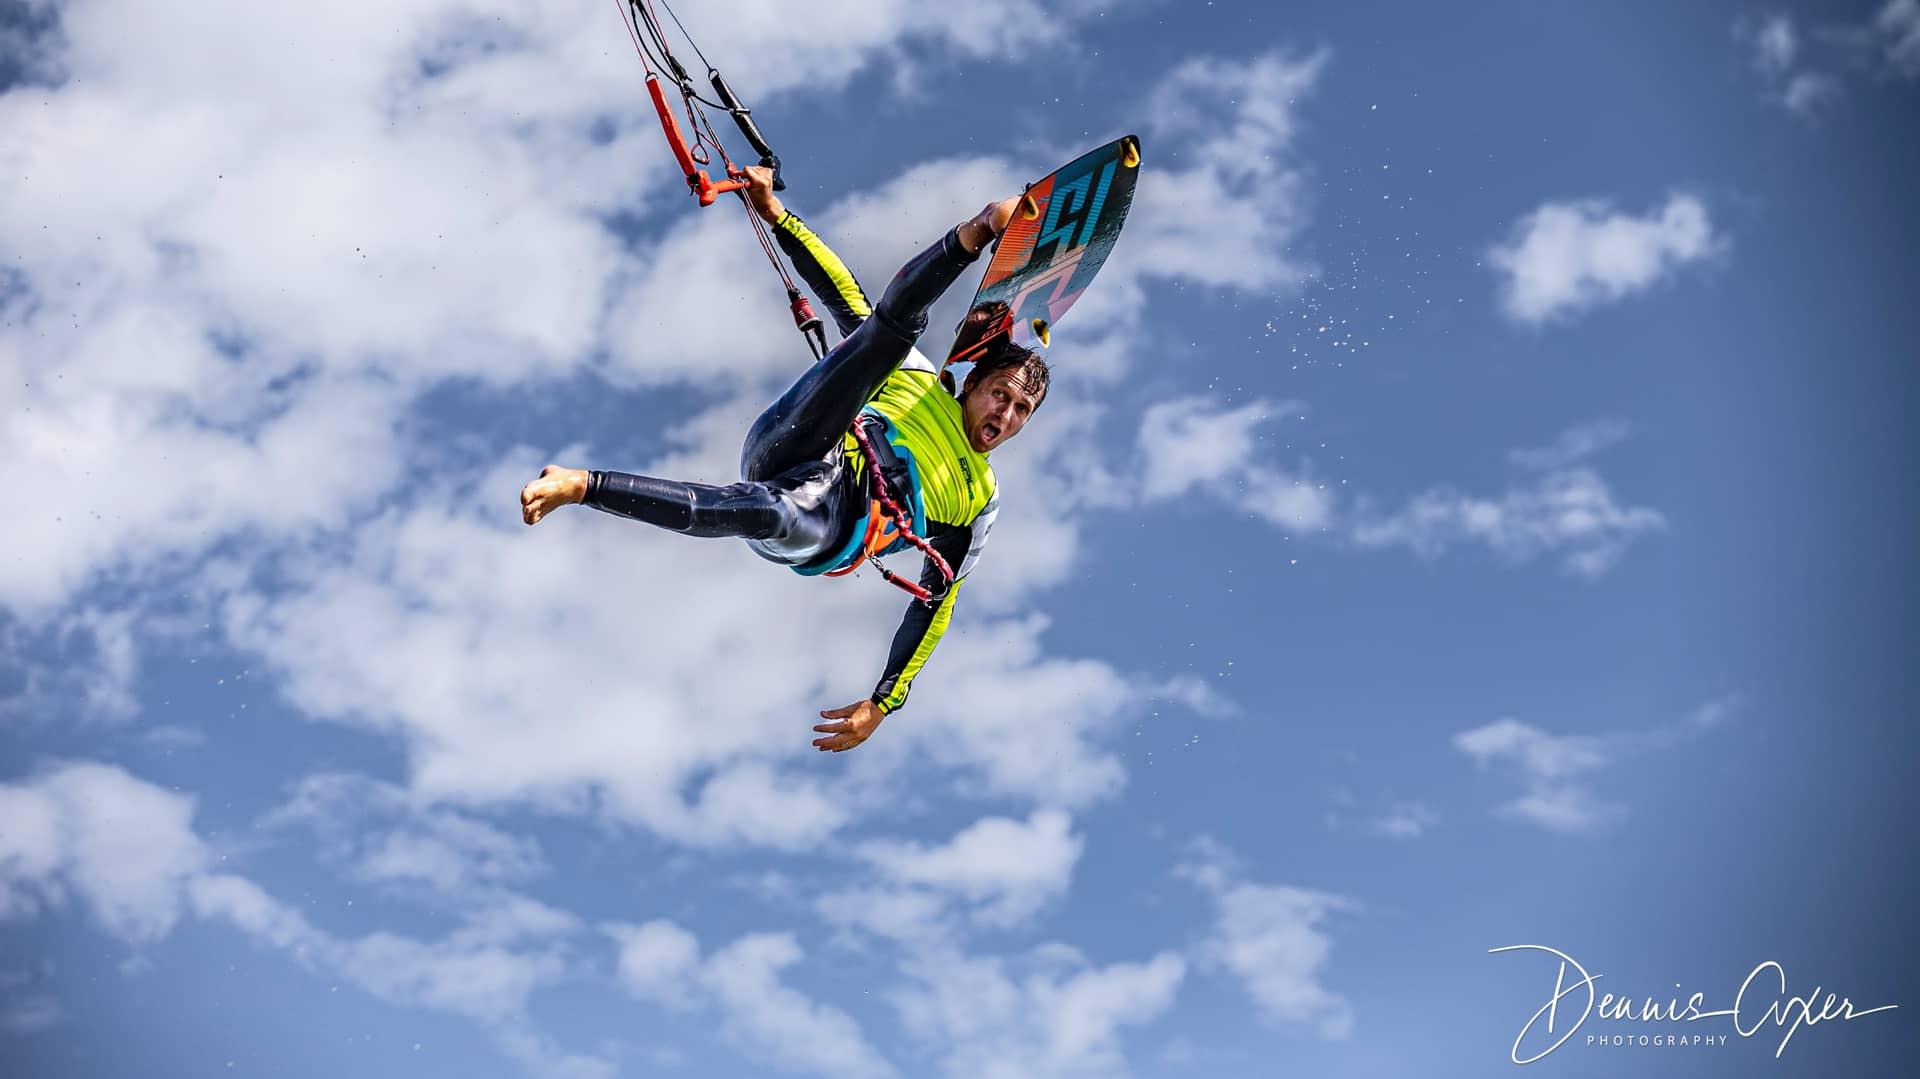 The Mask - with Epic Kites Kiteboarding